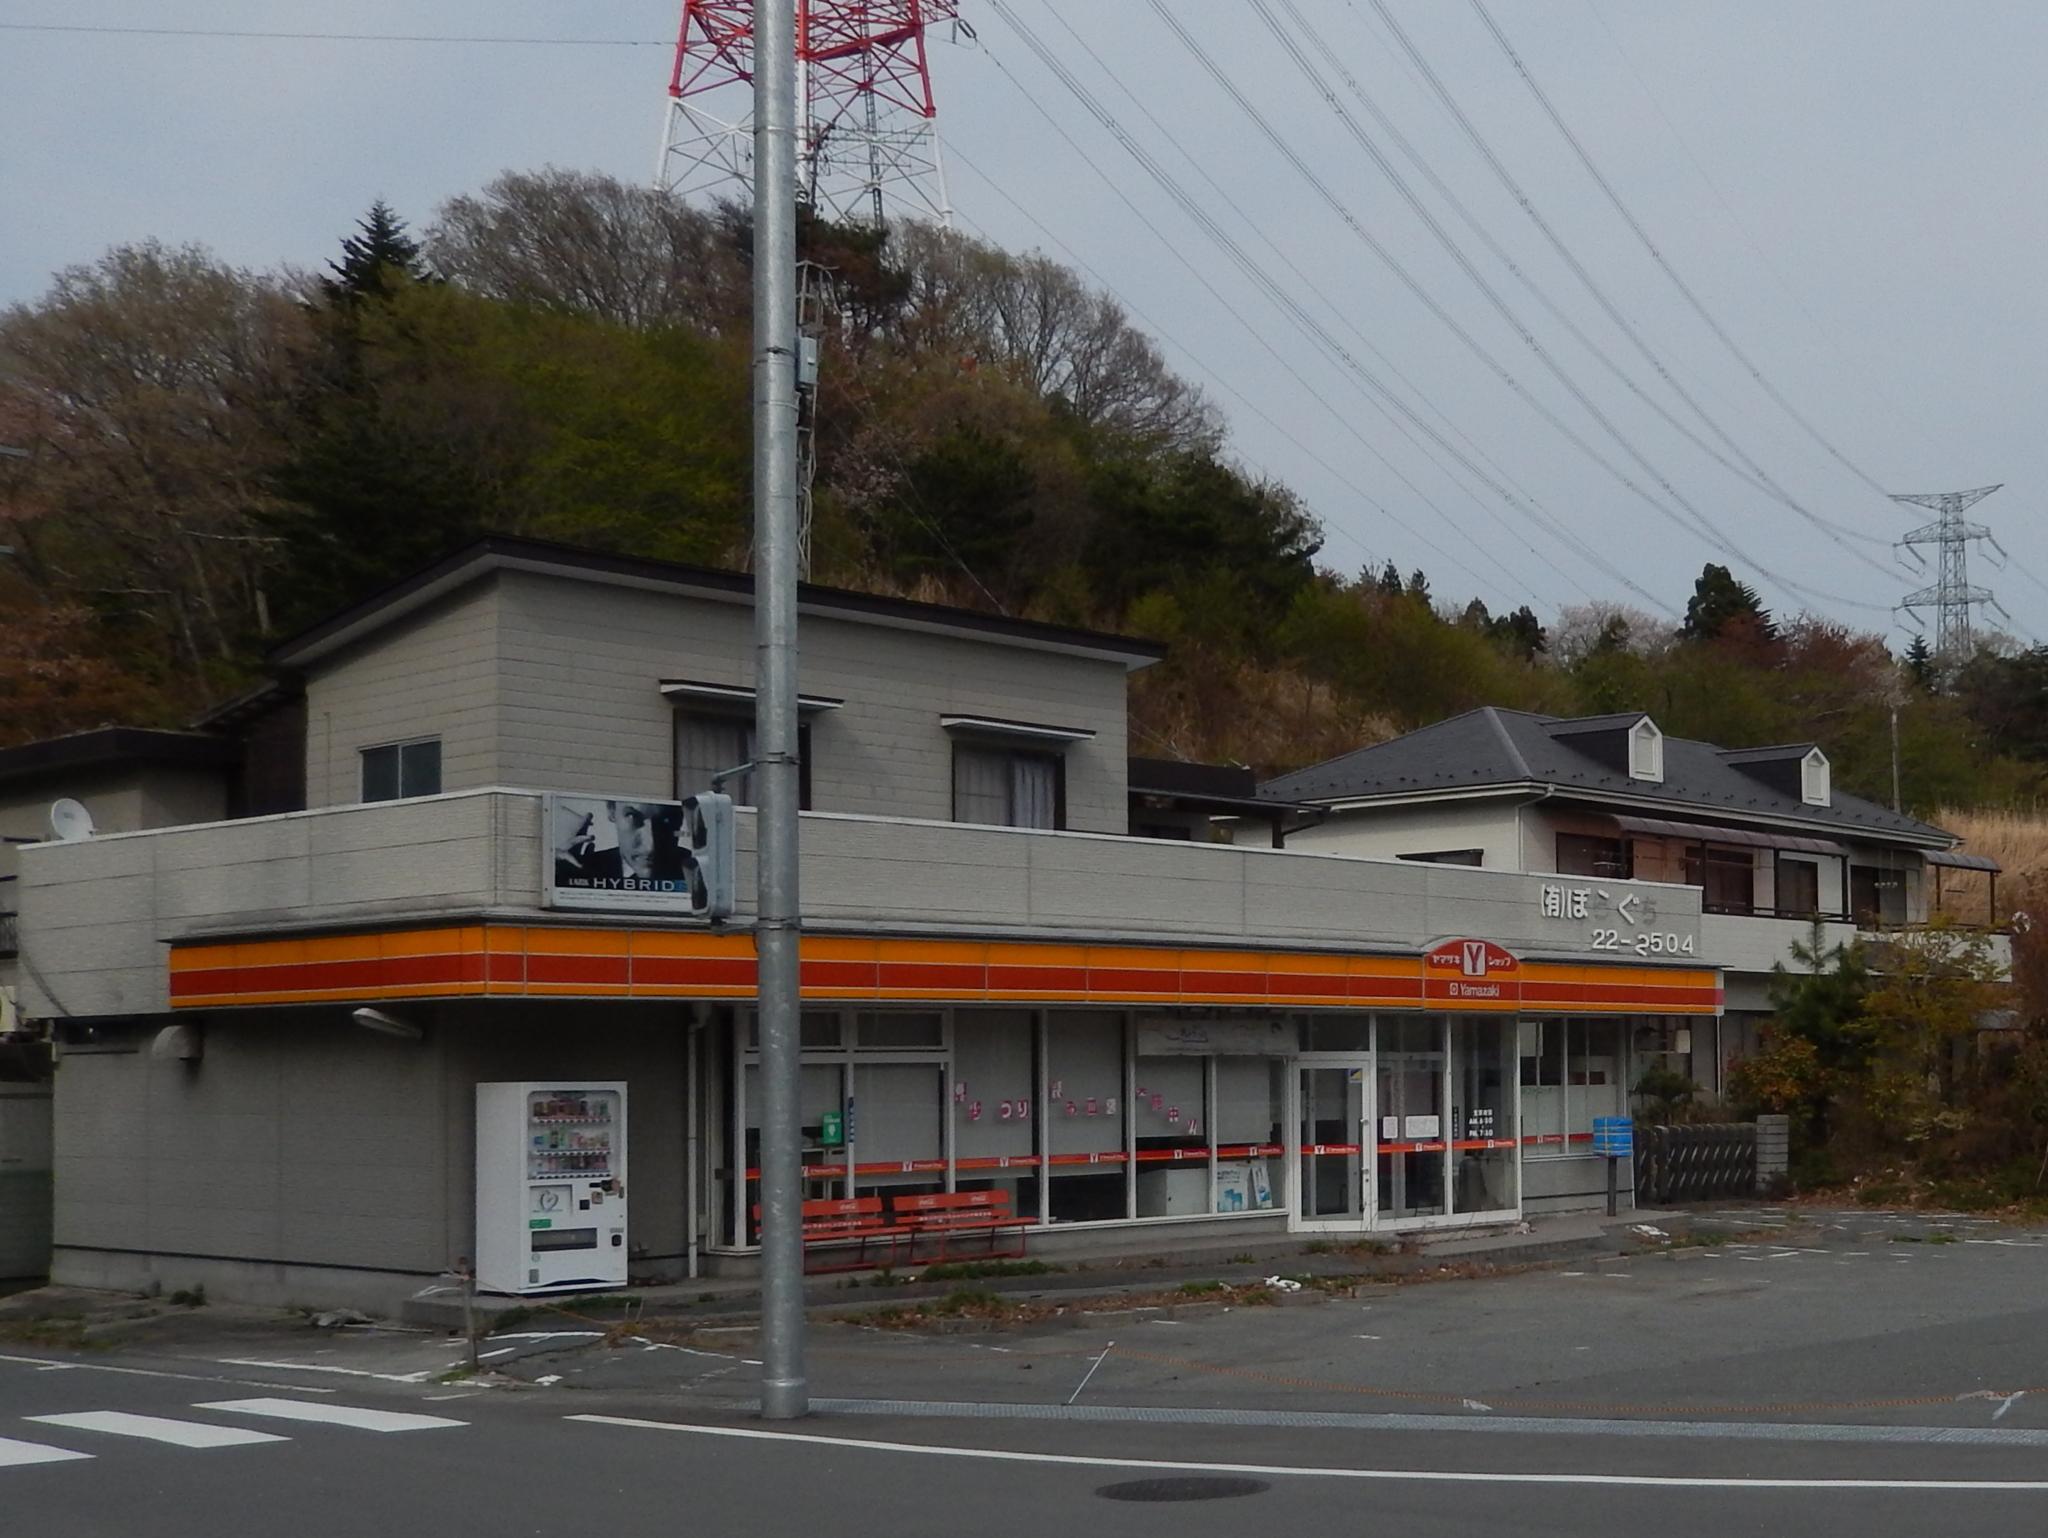 f:id:ToshUeno:20160416151025j:plain